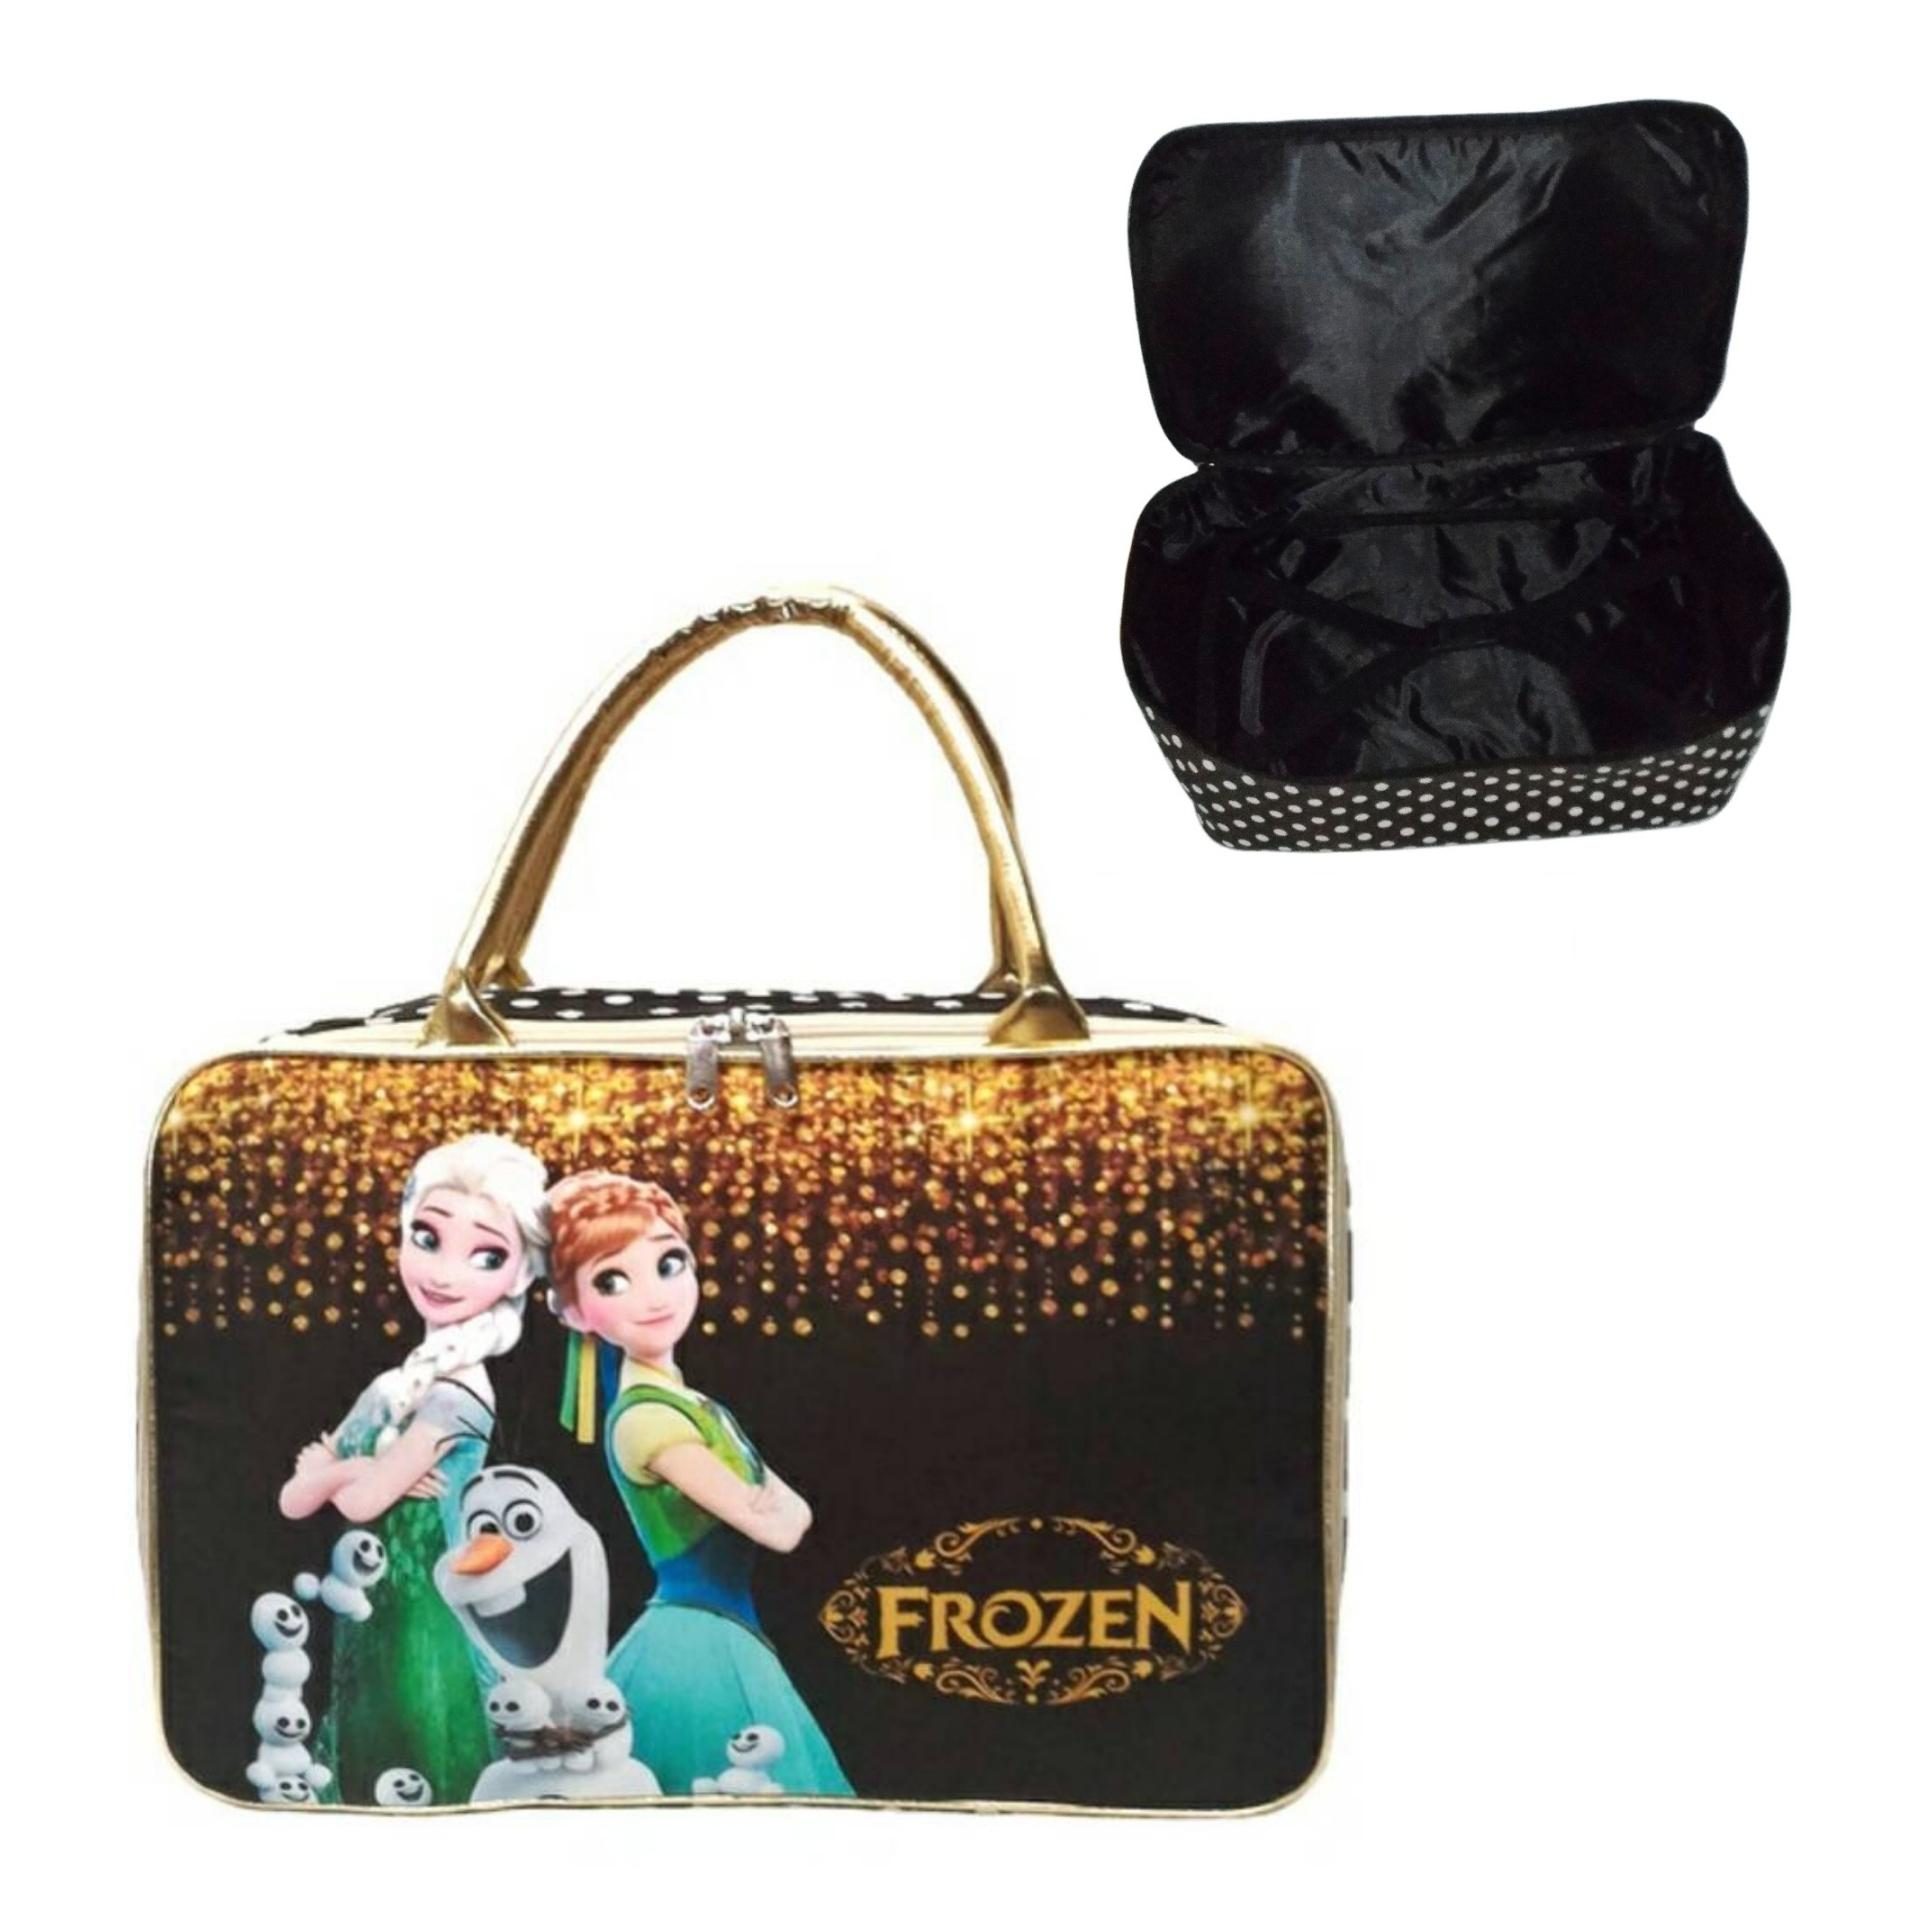 Amt Travel Bag Koper Anak Kanvas Dengan Karet Pengikat Baju Hitam Gold By Baby Kiddies Corner.